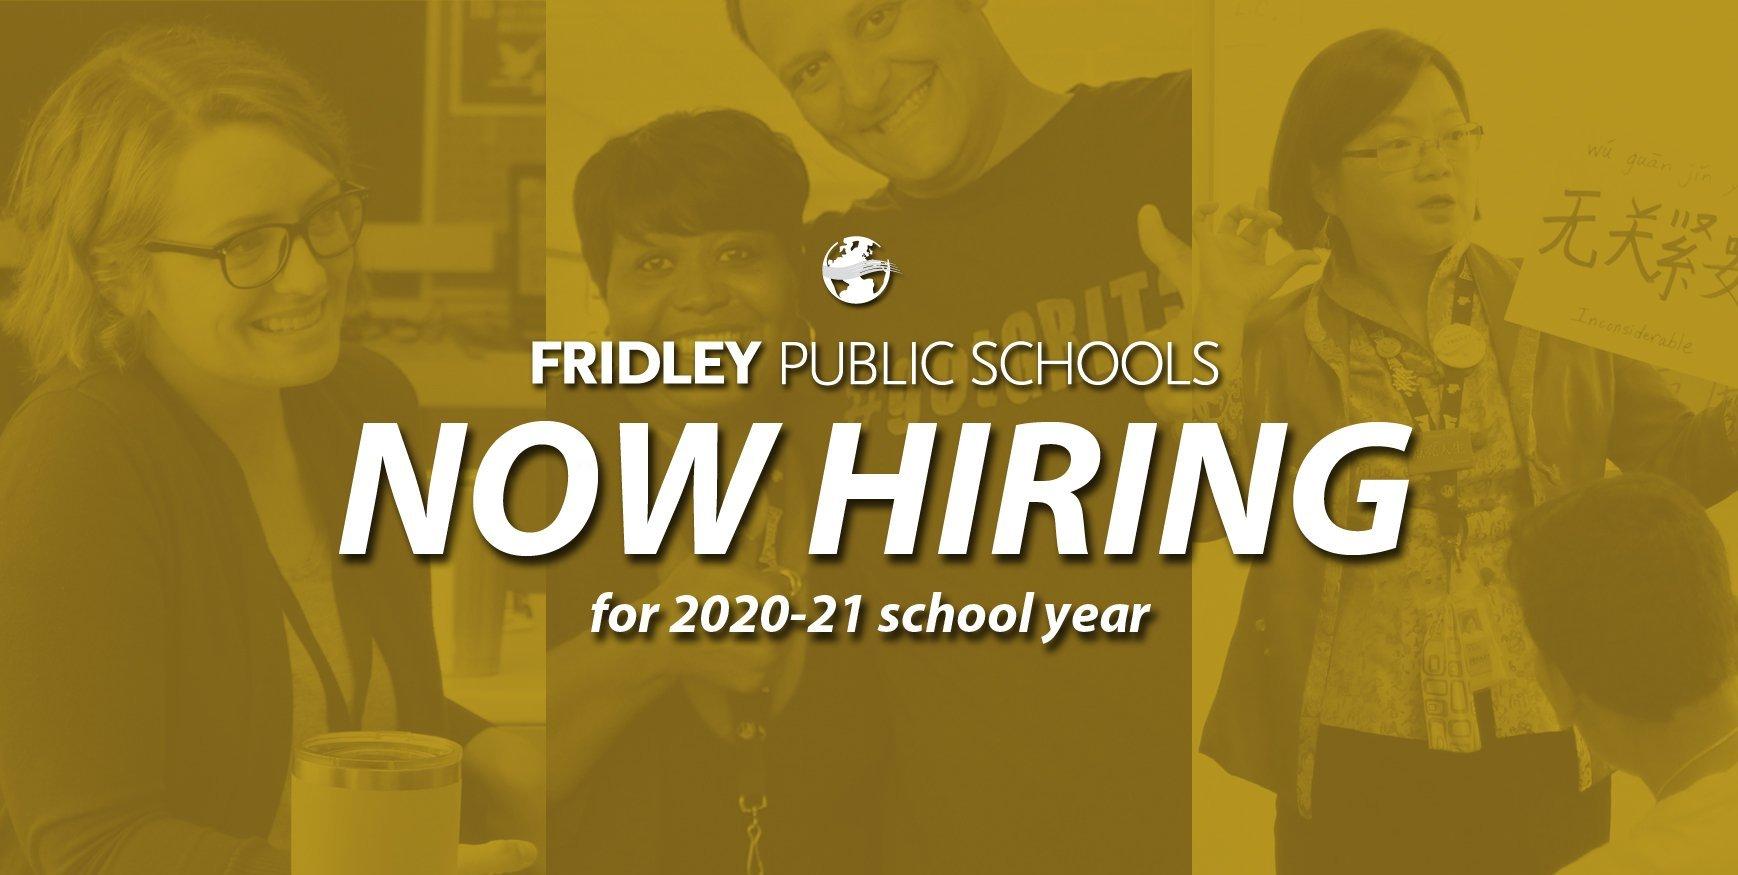 Hiring for 2020-21 school year